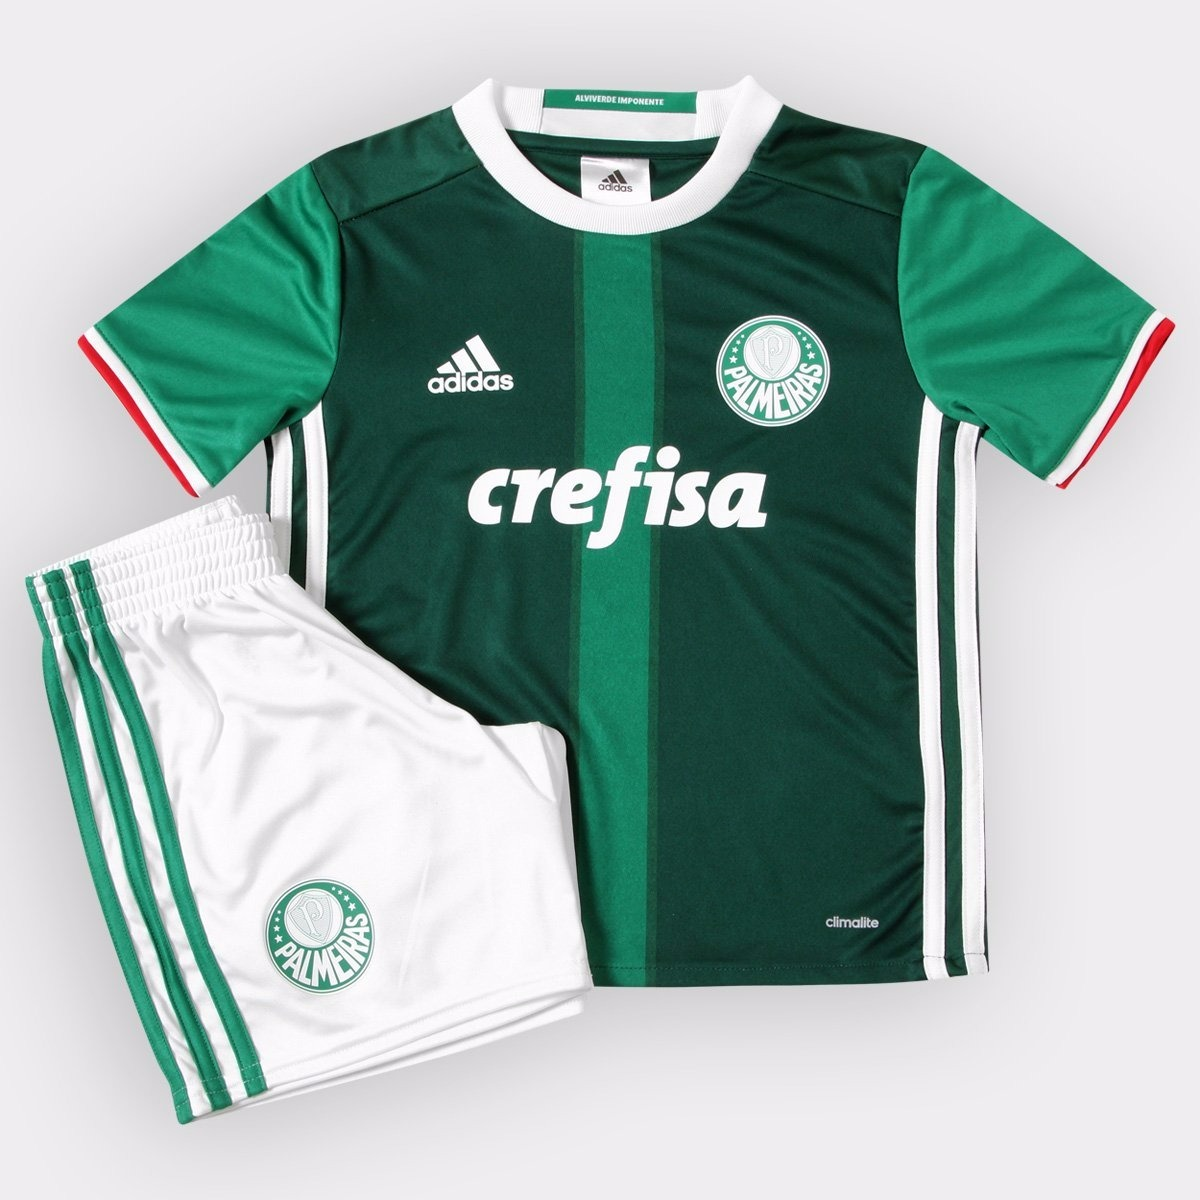 7ffbe2aa4c Kit Palmeiras Infantil adidas I 17 18 - Ai9194 - R  149